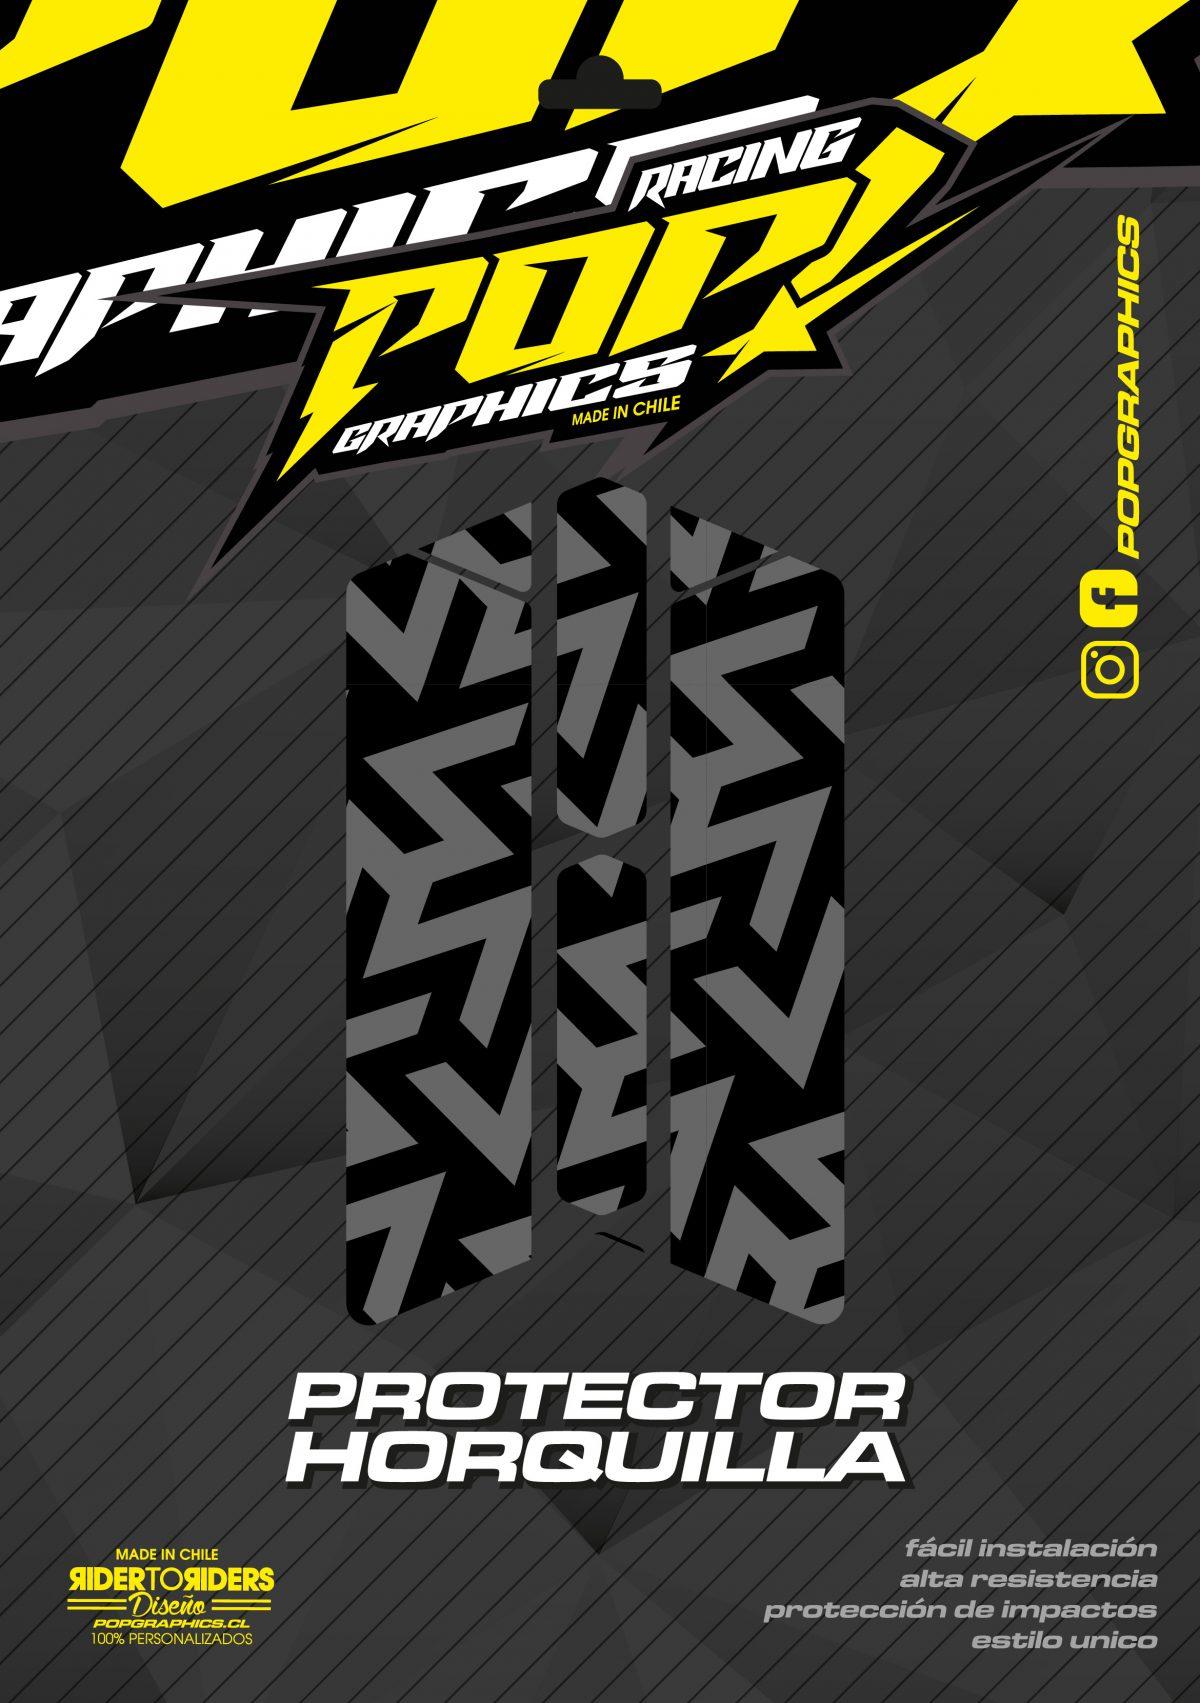 Protector horquilla formas grises